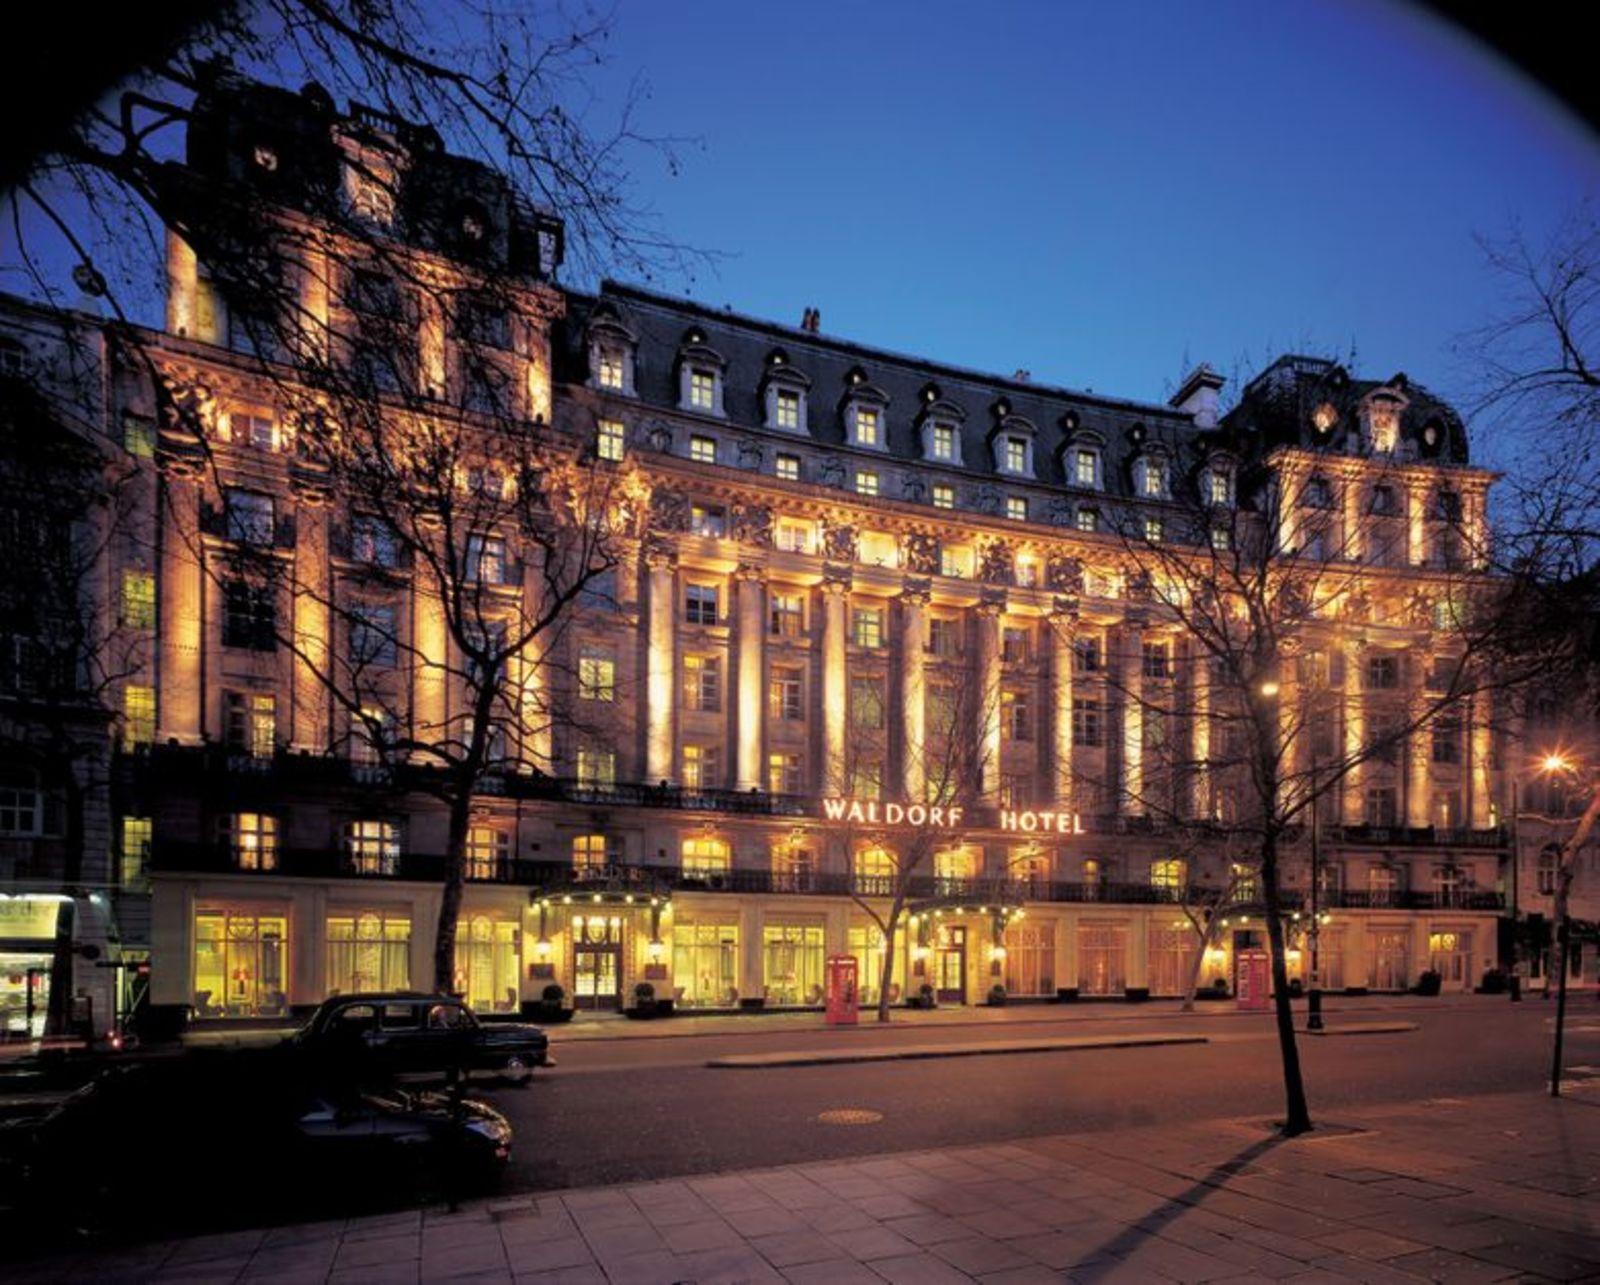 Uk, London, Waldorf Hilton